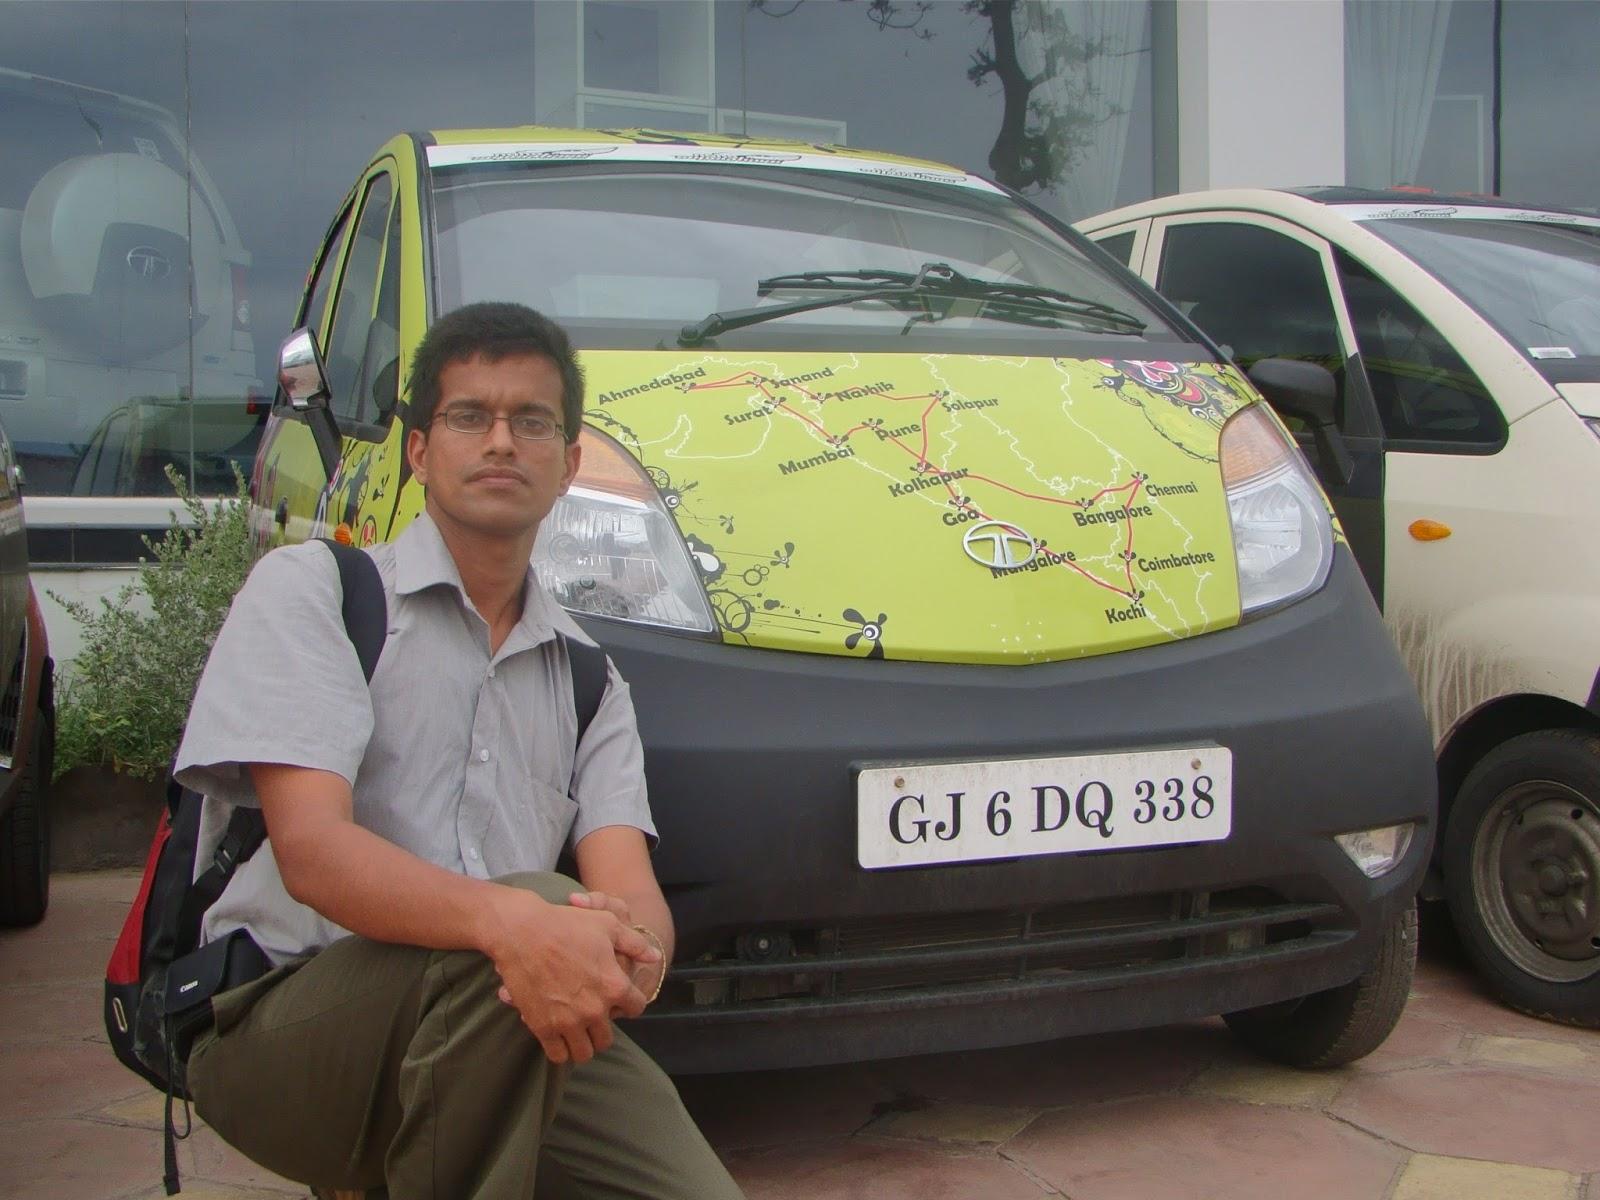 Car stickers design in coimbatore - Car Sticker Kochi Car Sticker Kochi Seeing This Car Again In 2015 Refreshed All My